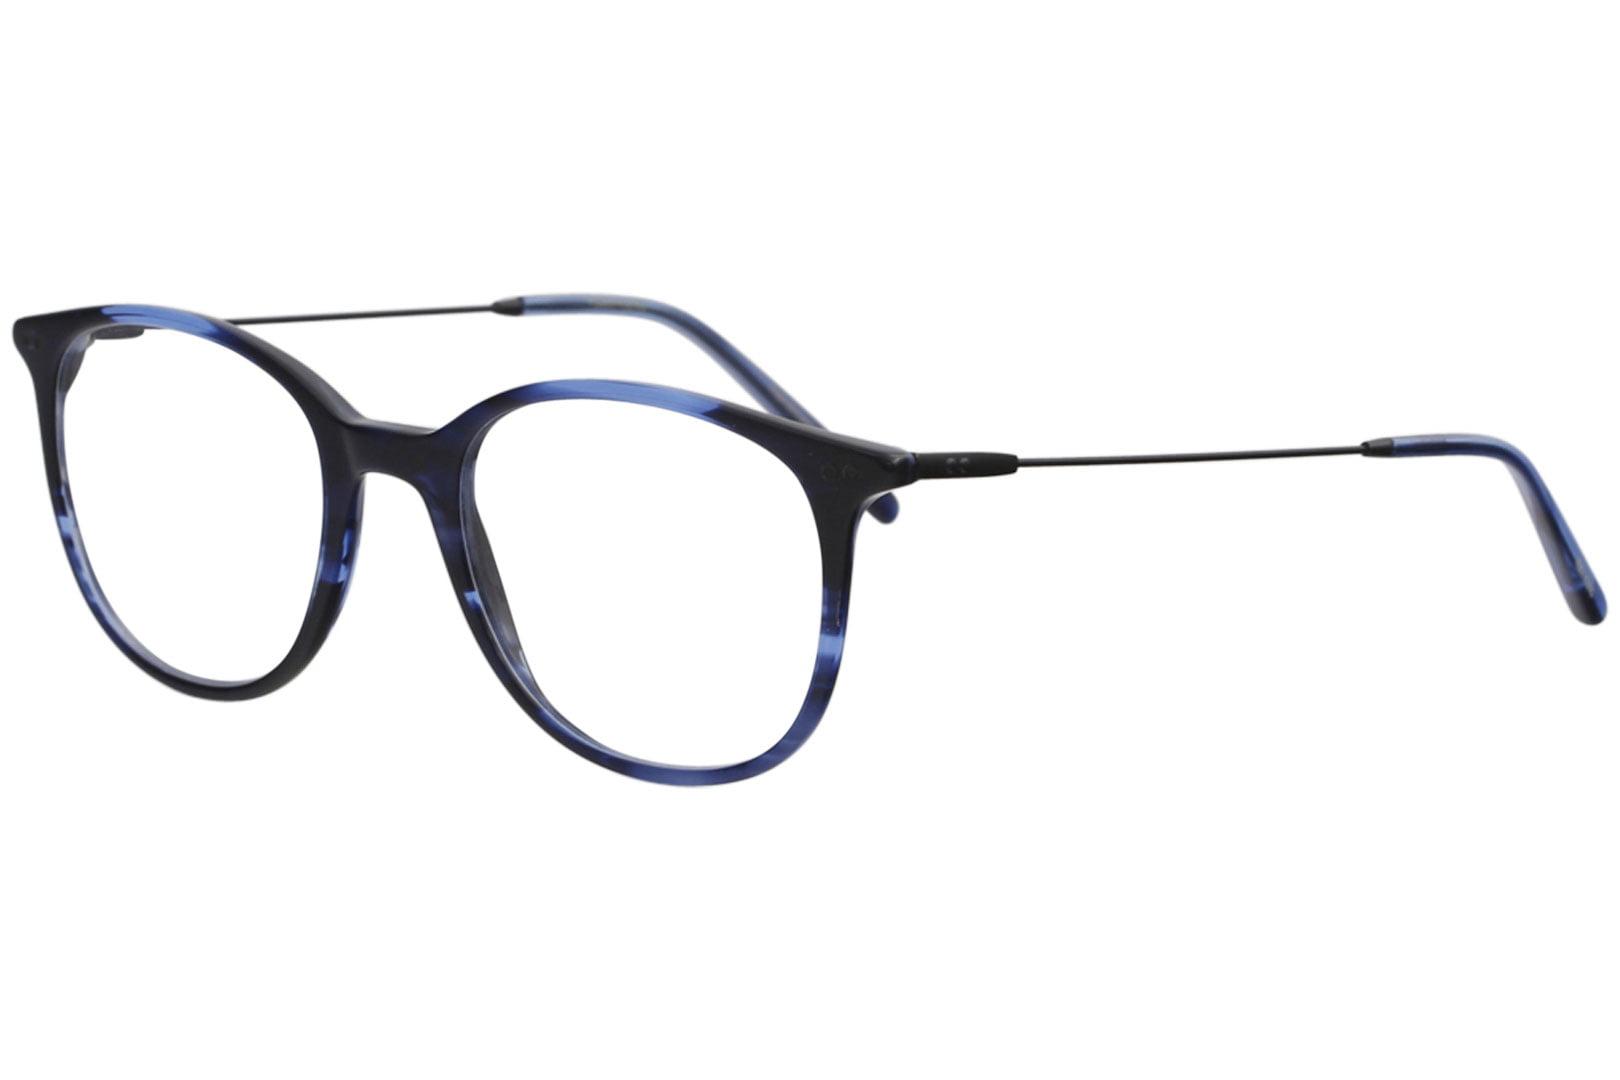 Vera Wang Womens Eyeglasses Diandra GT Granite Full Rim Optical Frame 53mm